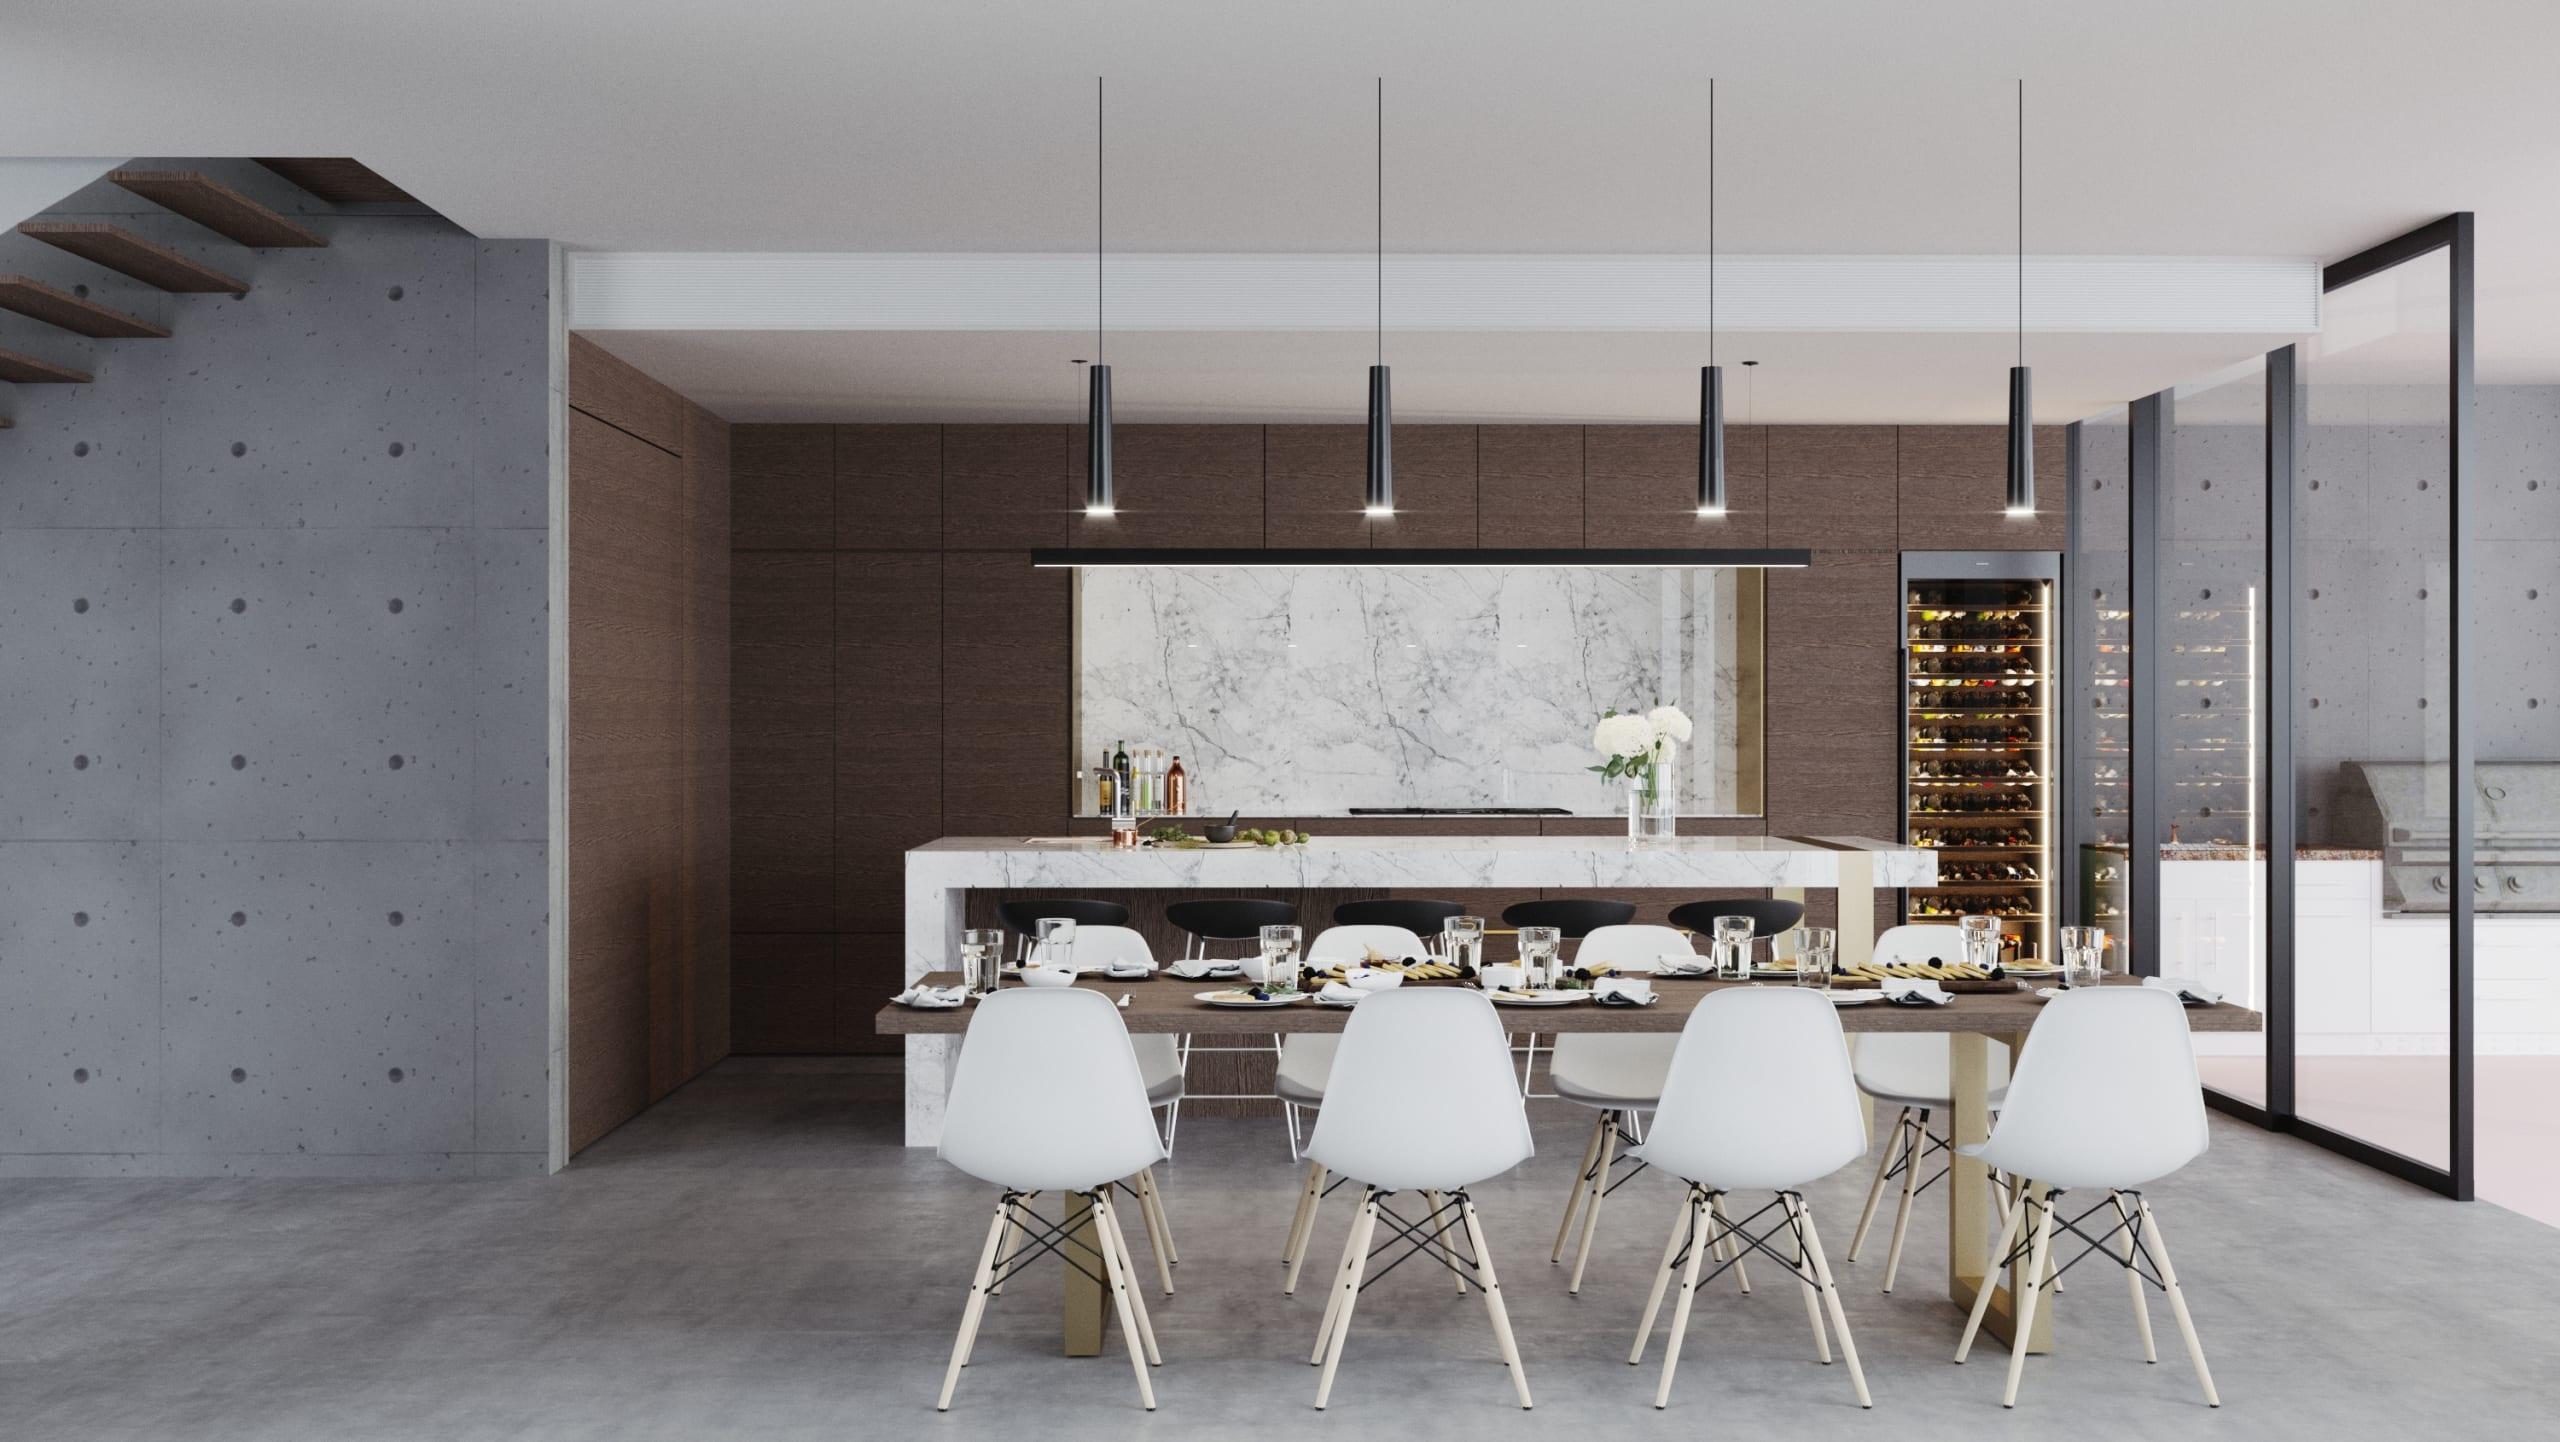 The Sanctuary Photorealistic Visualisation - Dining & Kitchen Render